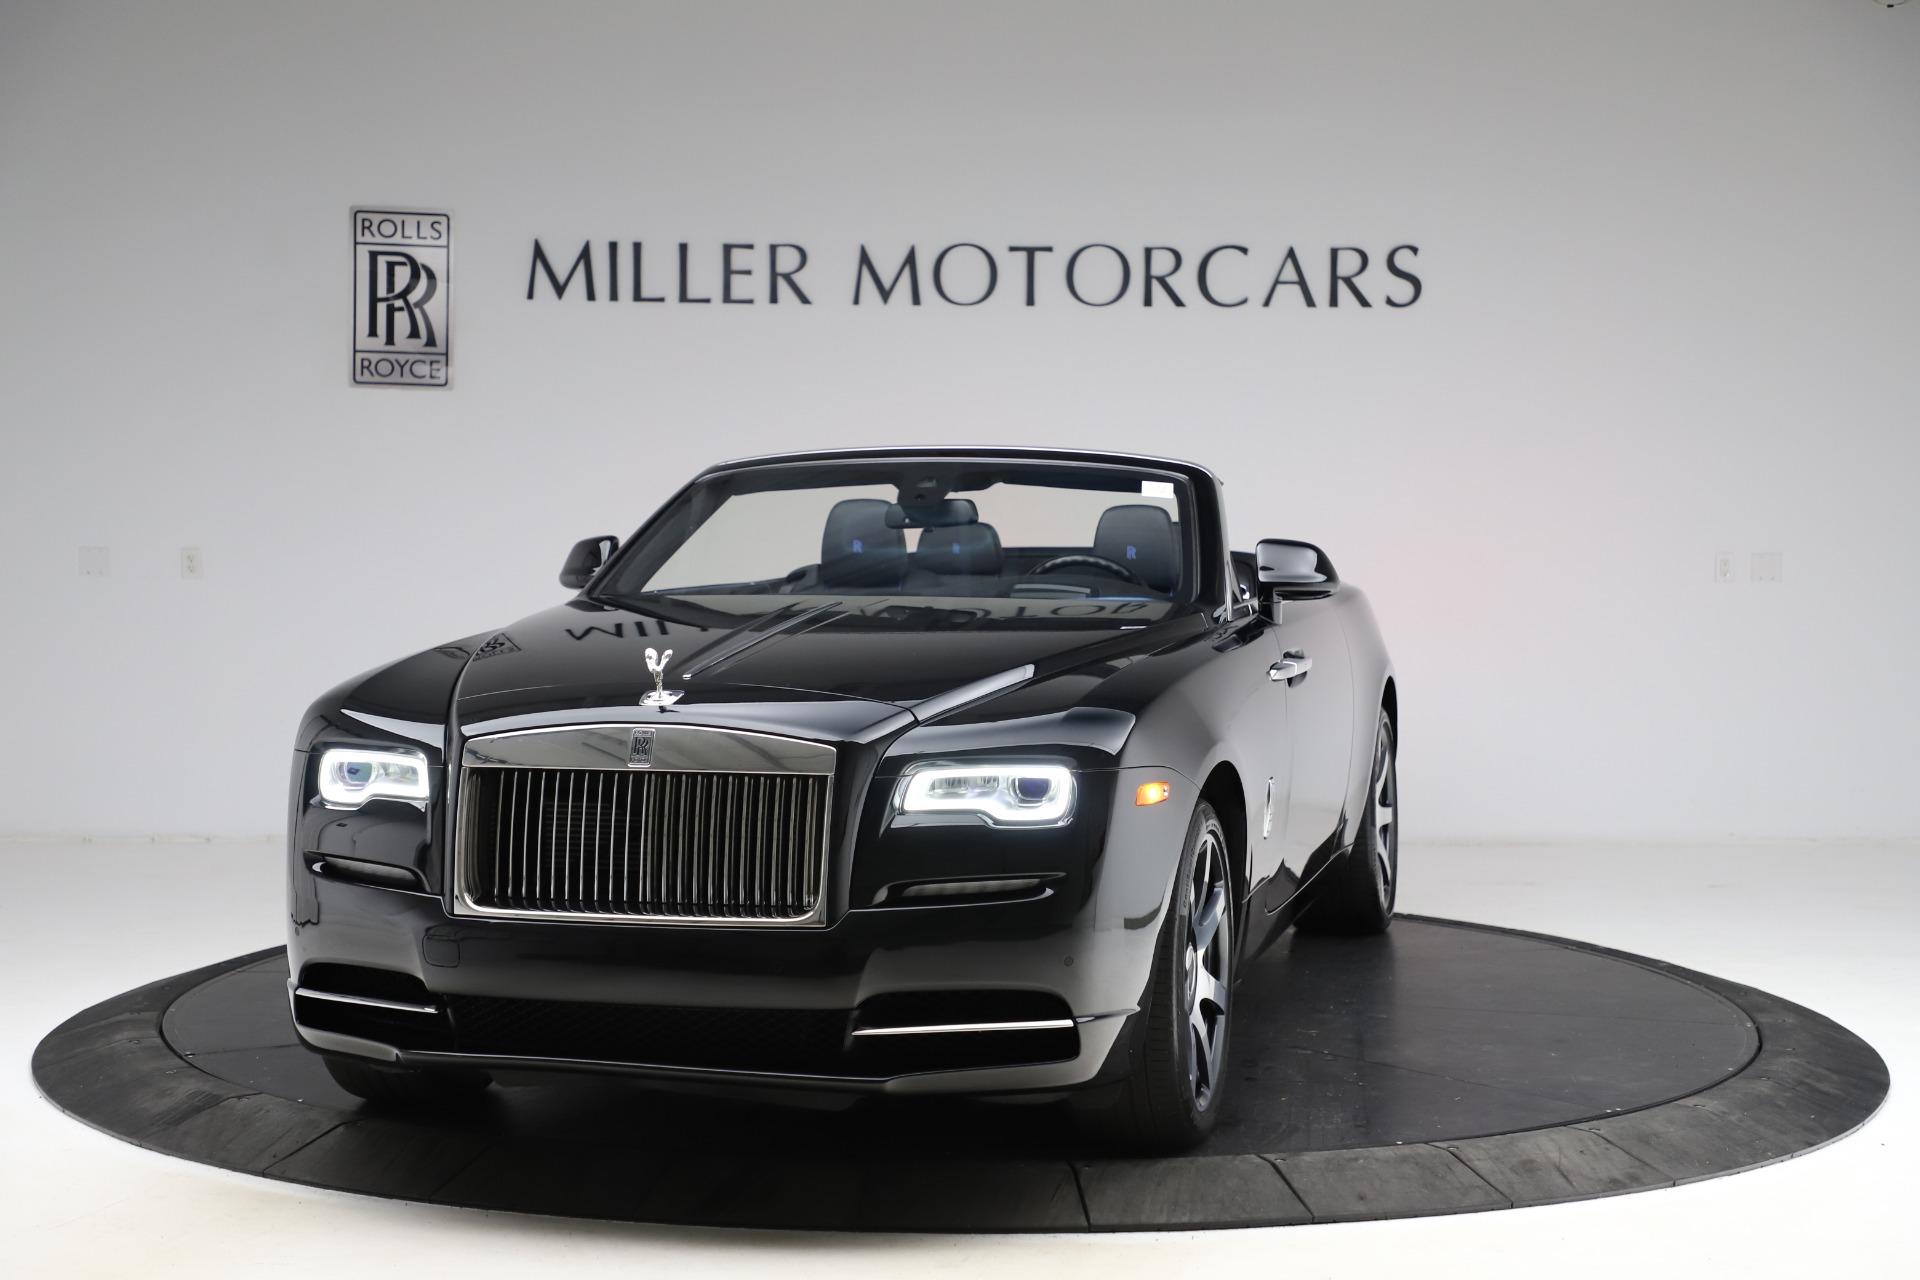 Used 2017 Rolls-Royce Dawn for sale $229,900 at Rolls-Royce Motor Cars Greenwich in Greenwich CT 06830 1